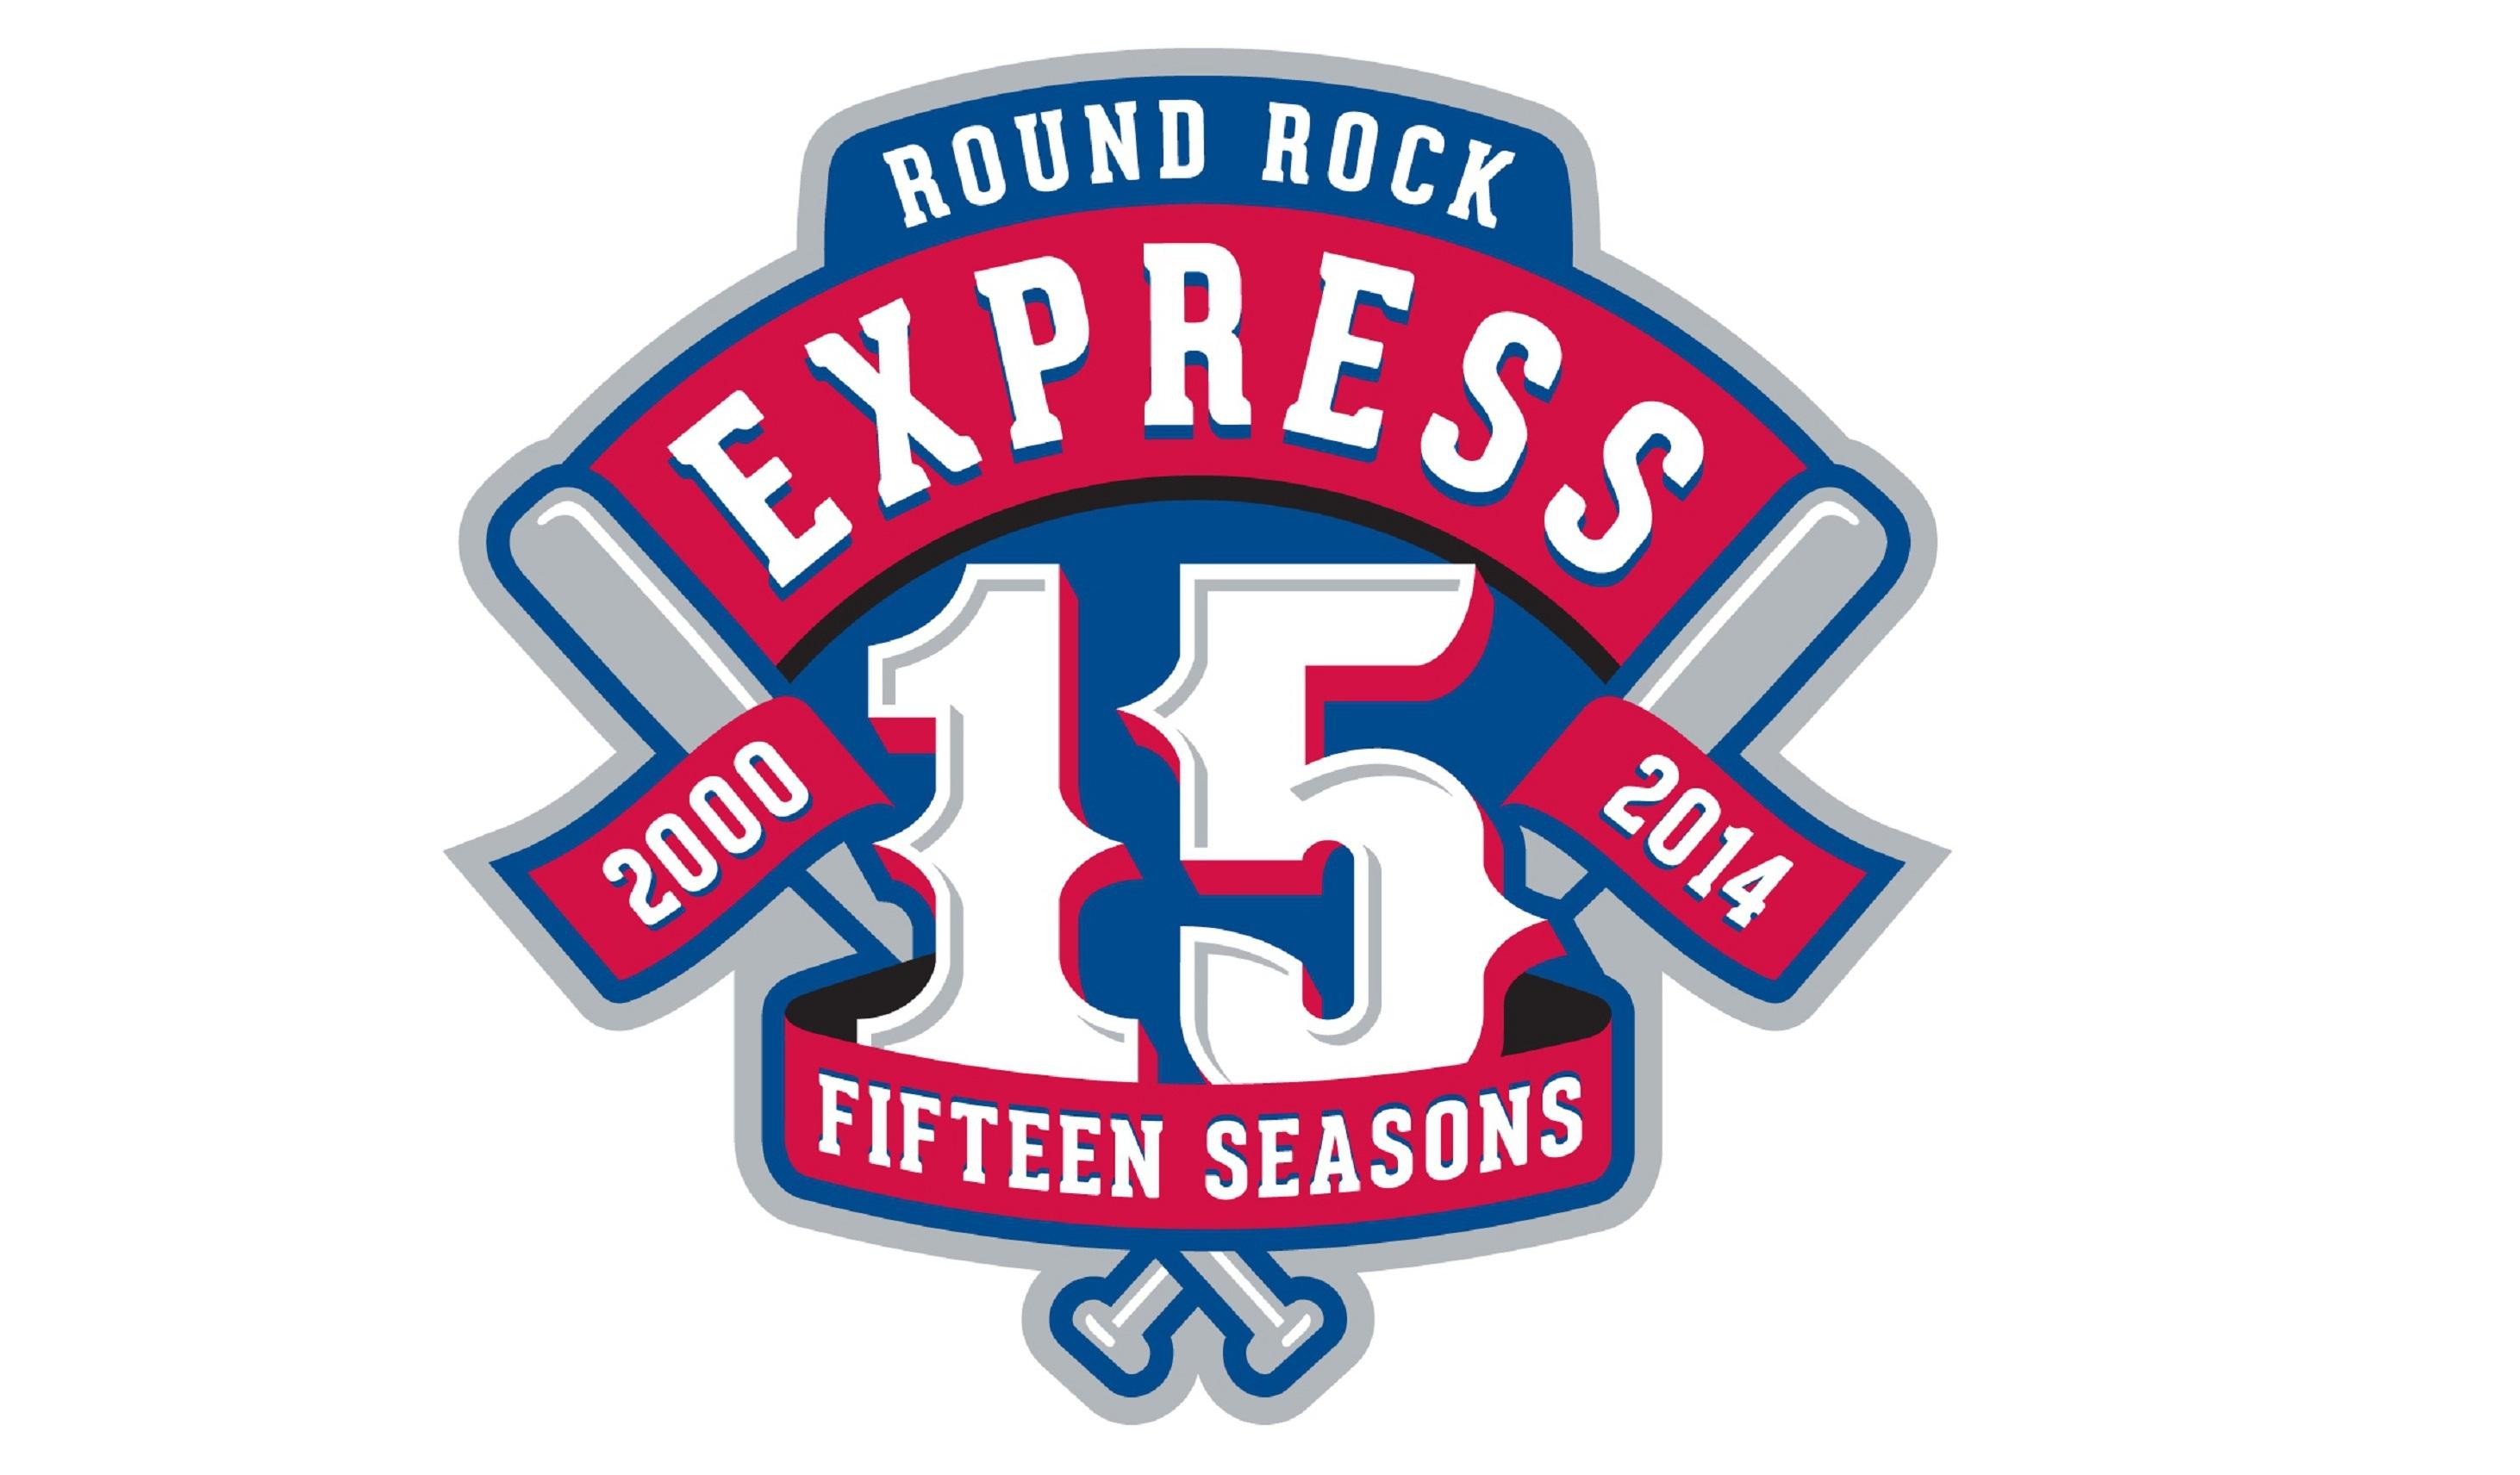 Round Rock Express